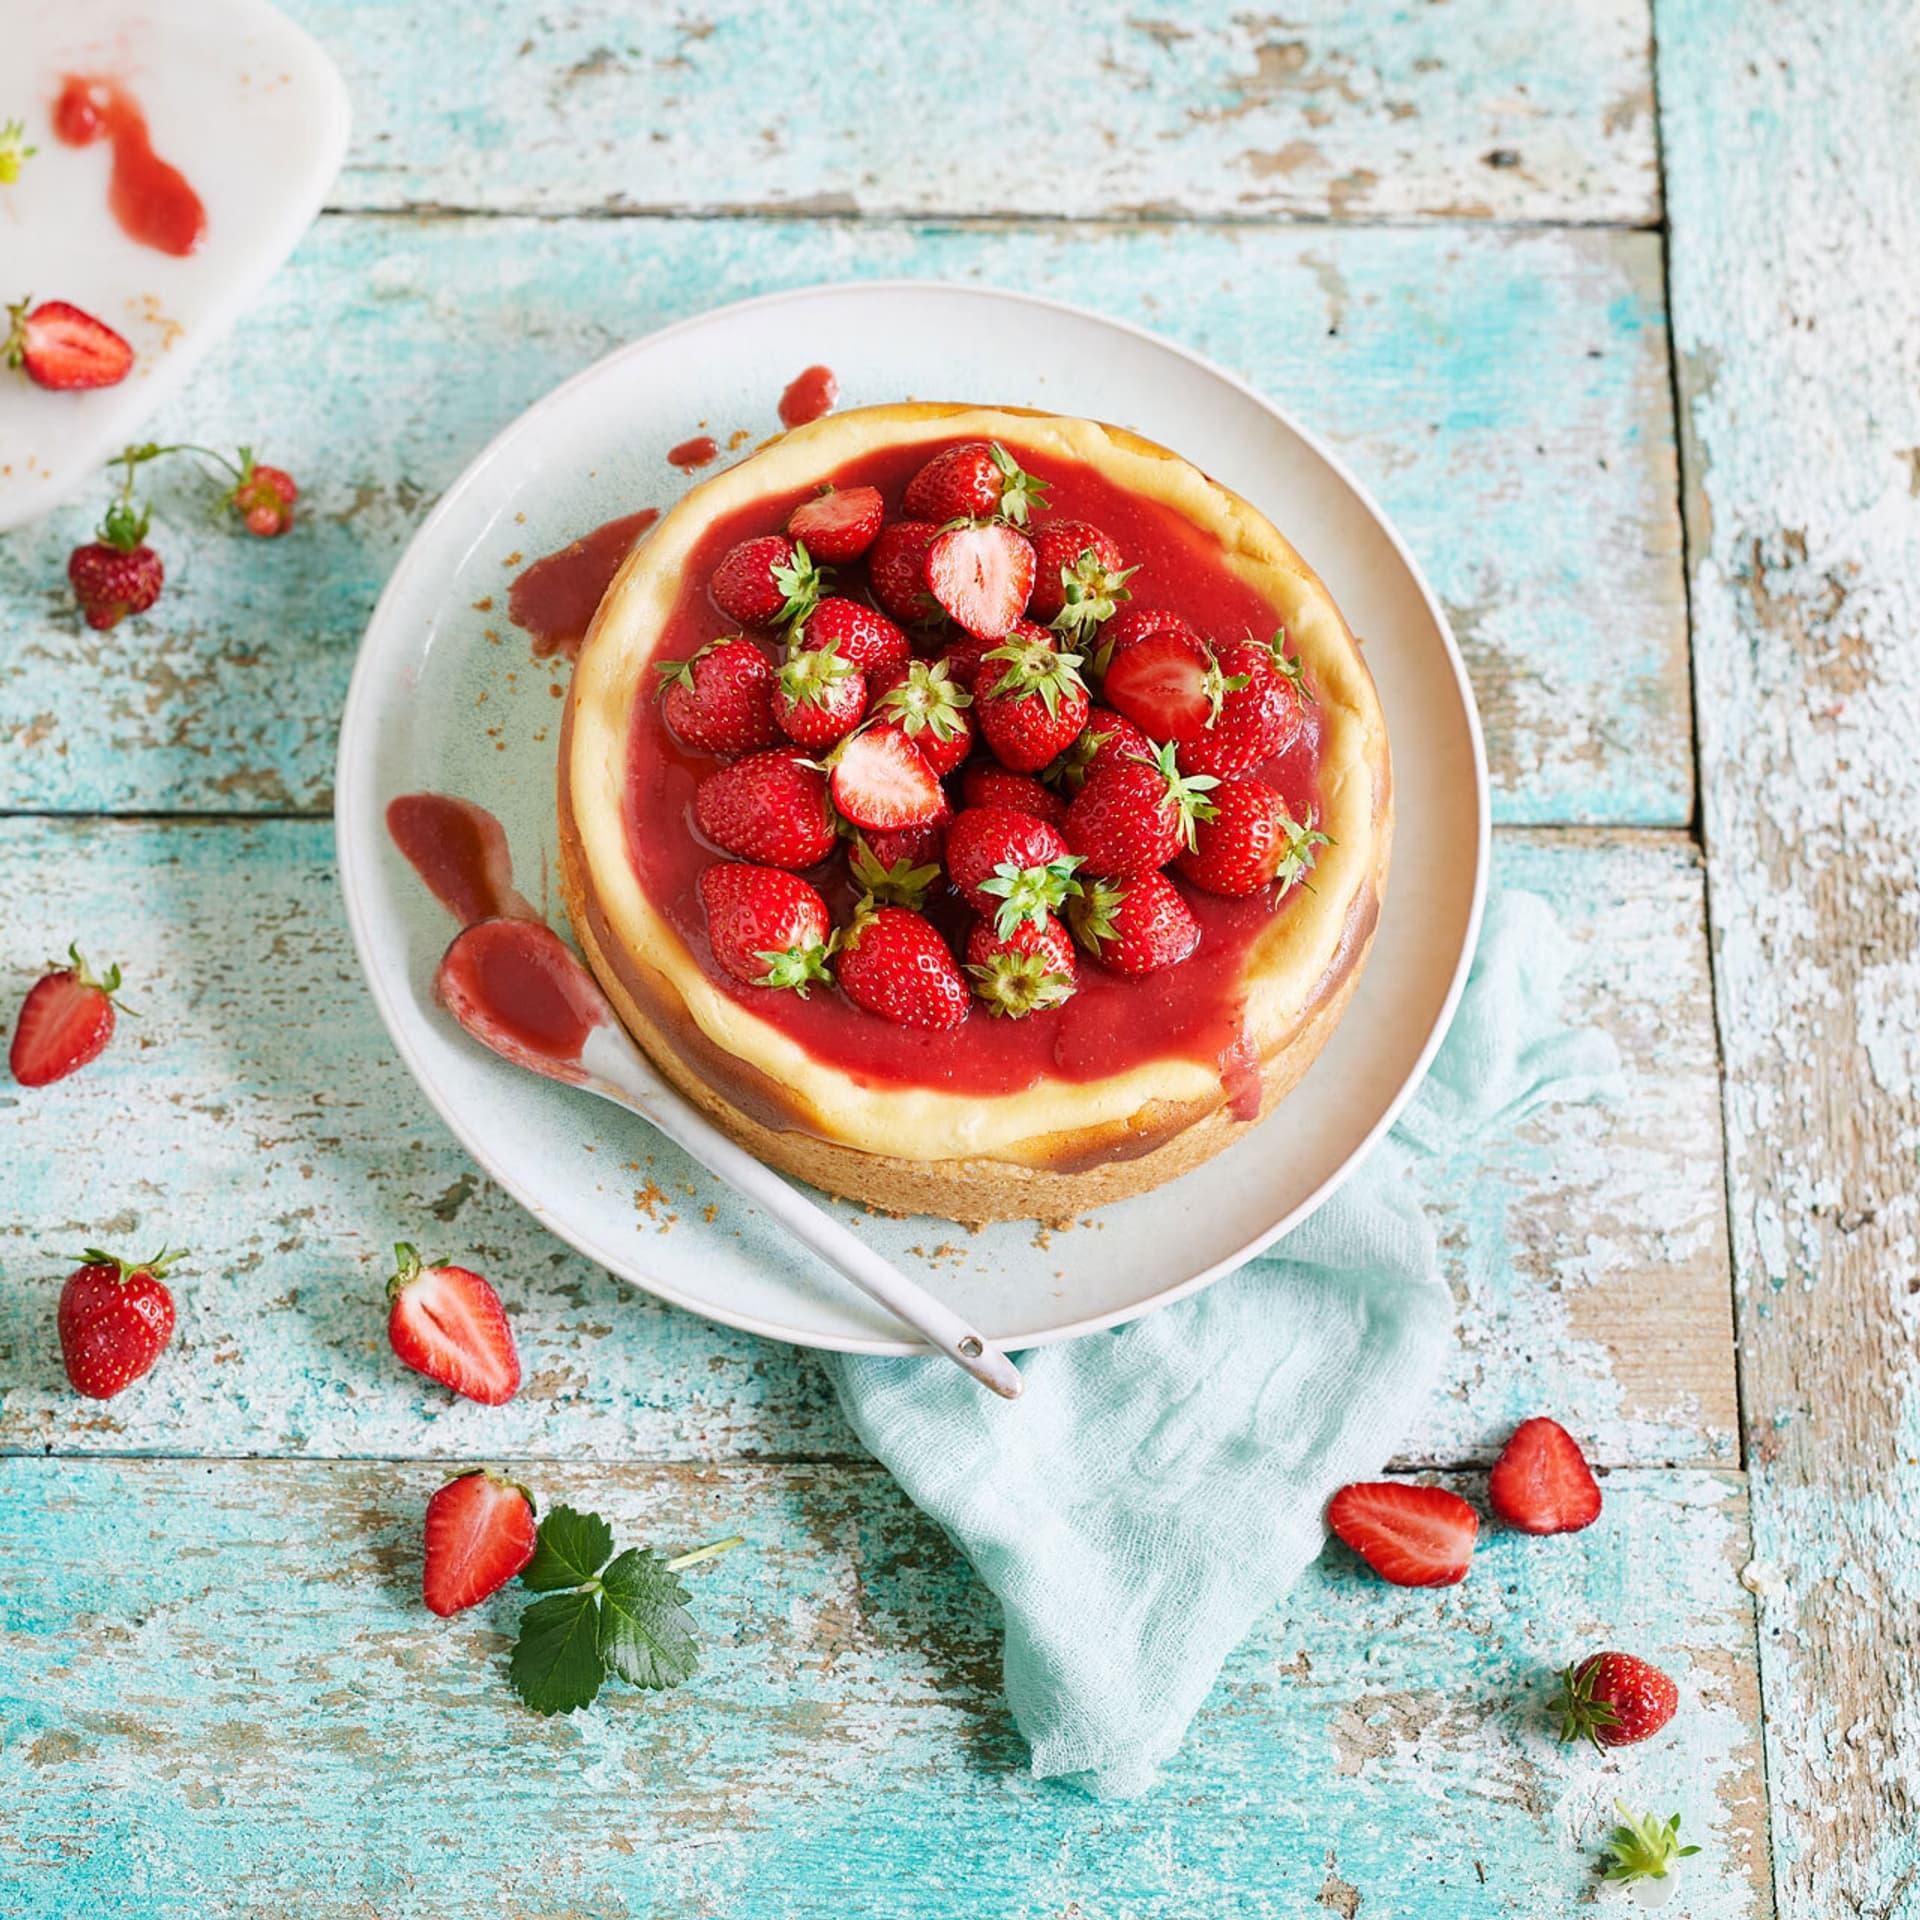 Erdbeeren und Erdbeerkuchen